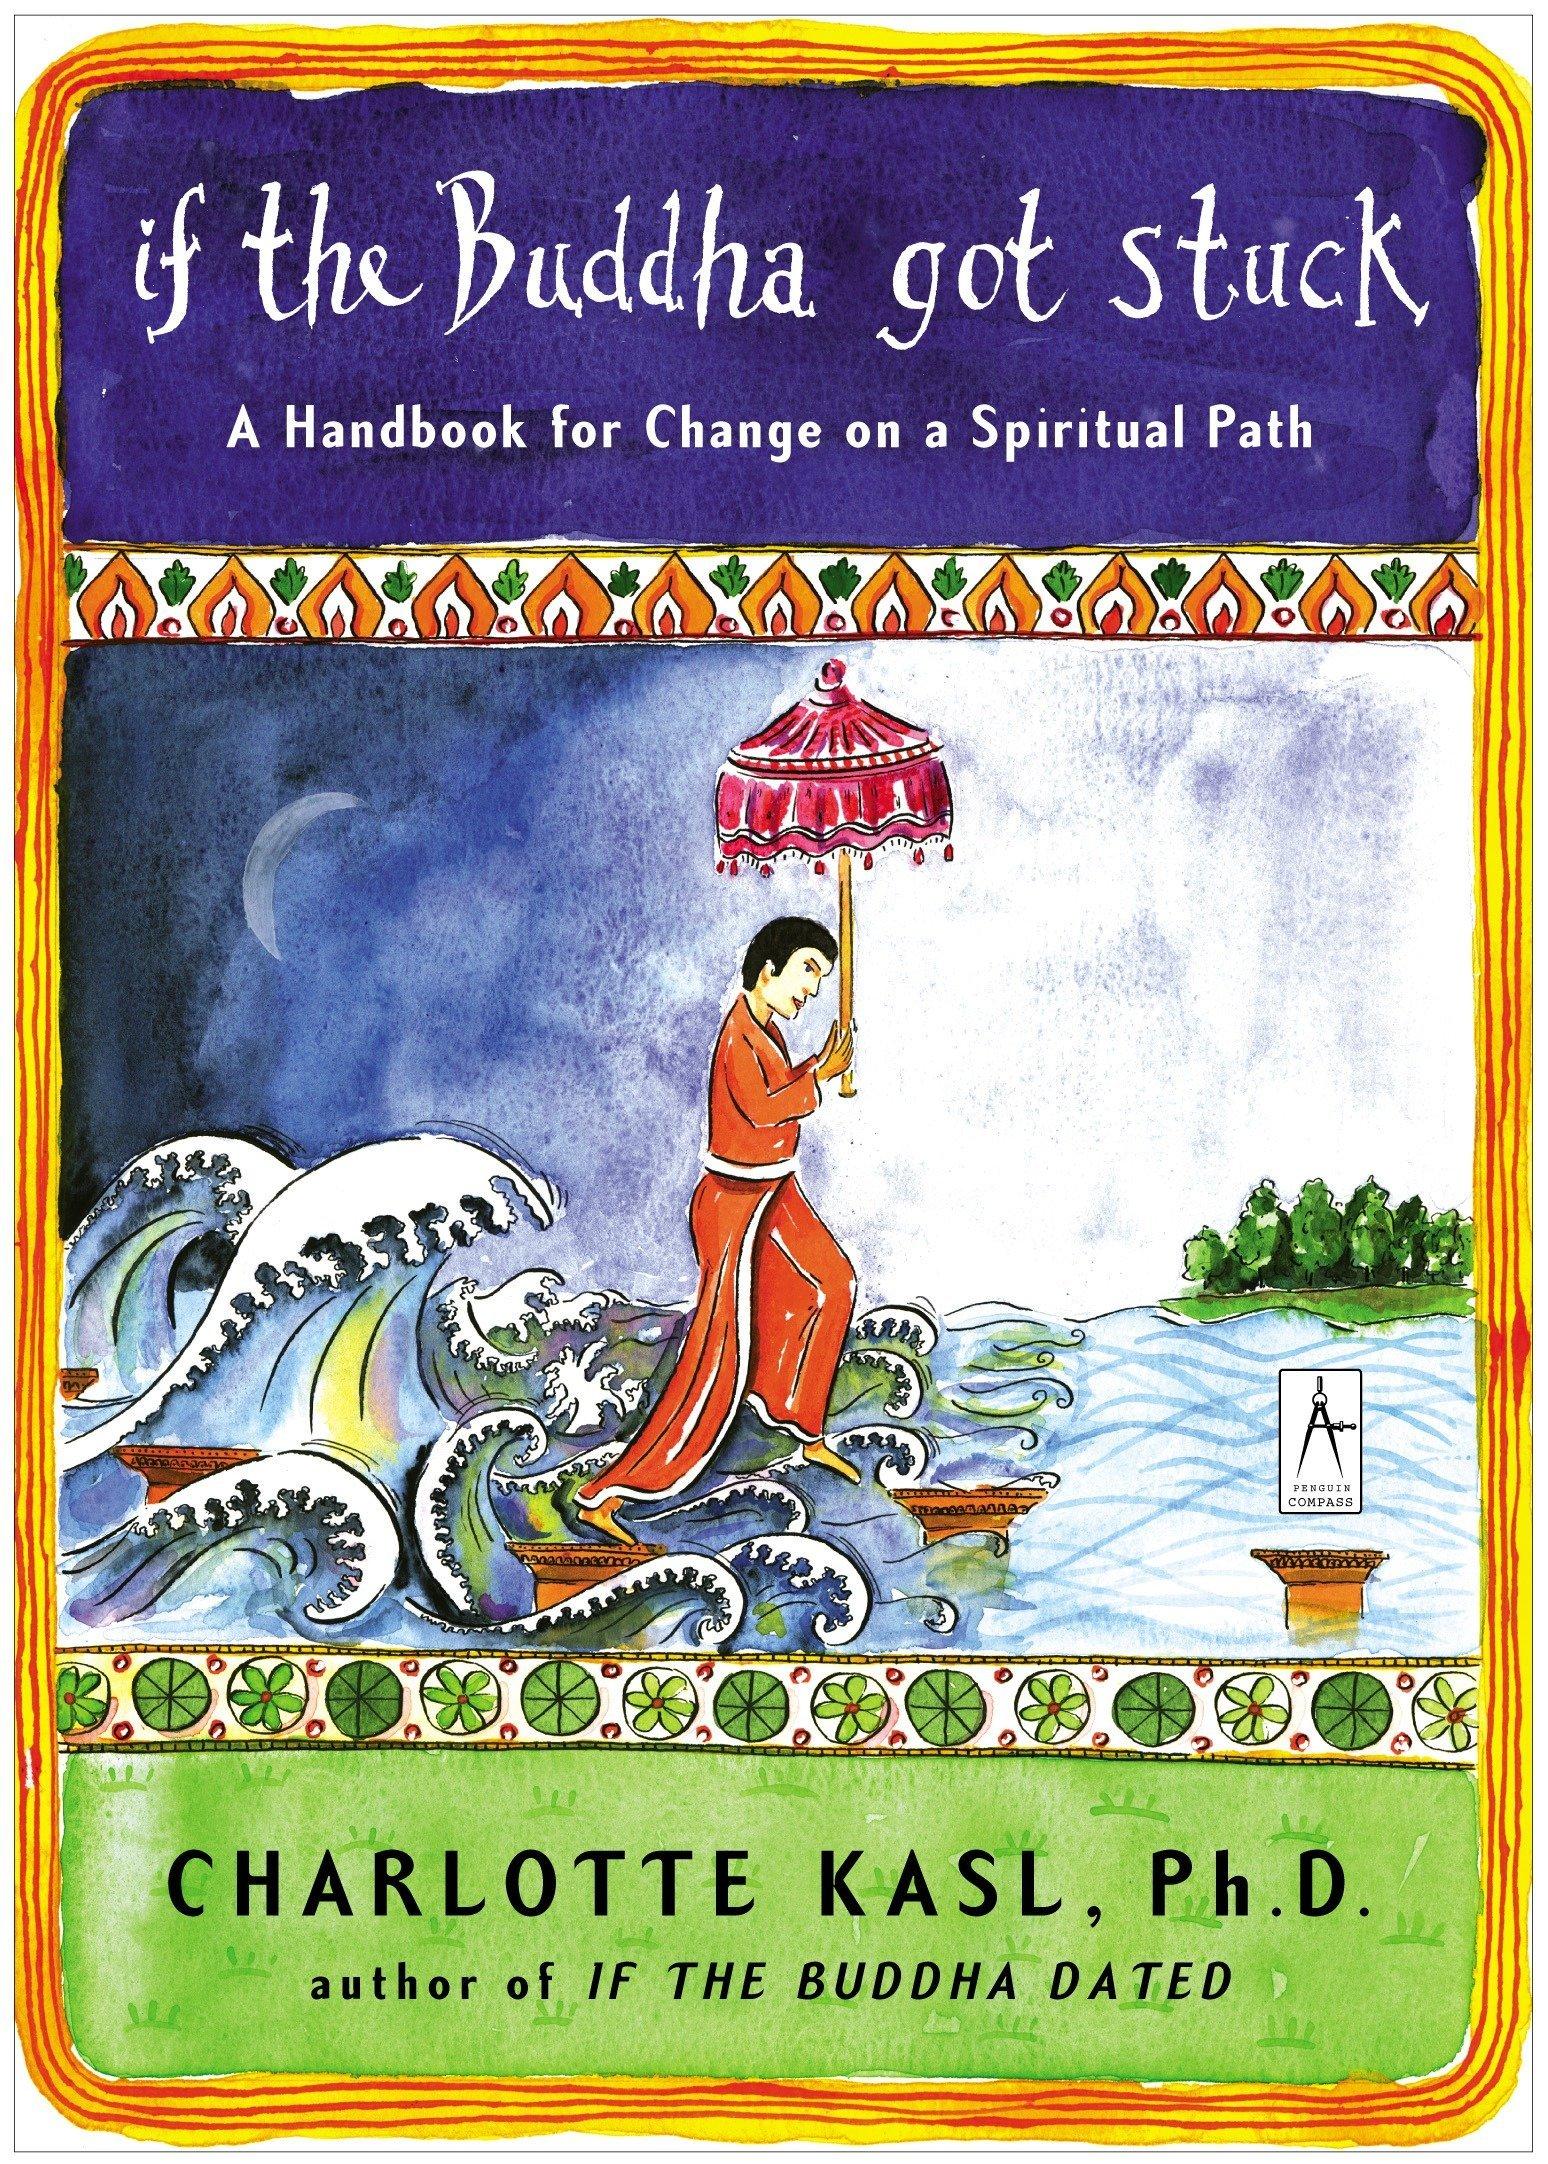 If the Buddha Got Stuck: A Handbook for Change on a Spiritual Path